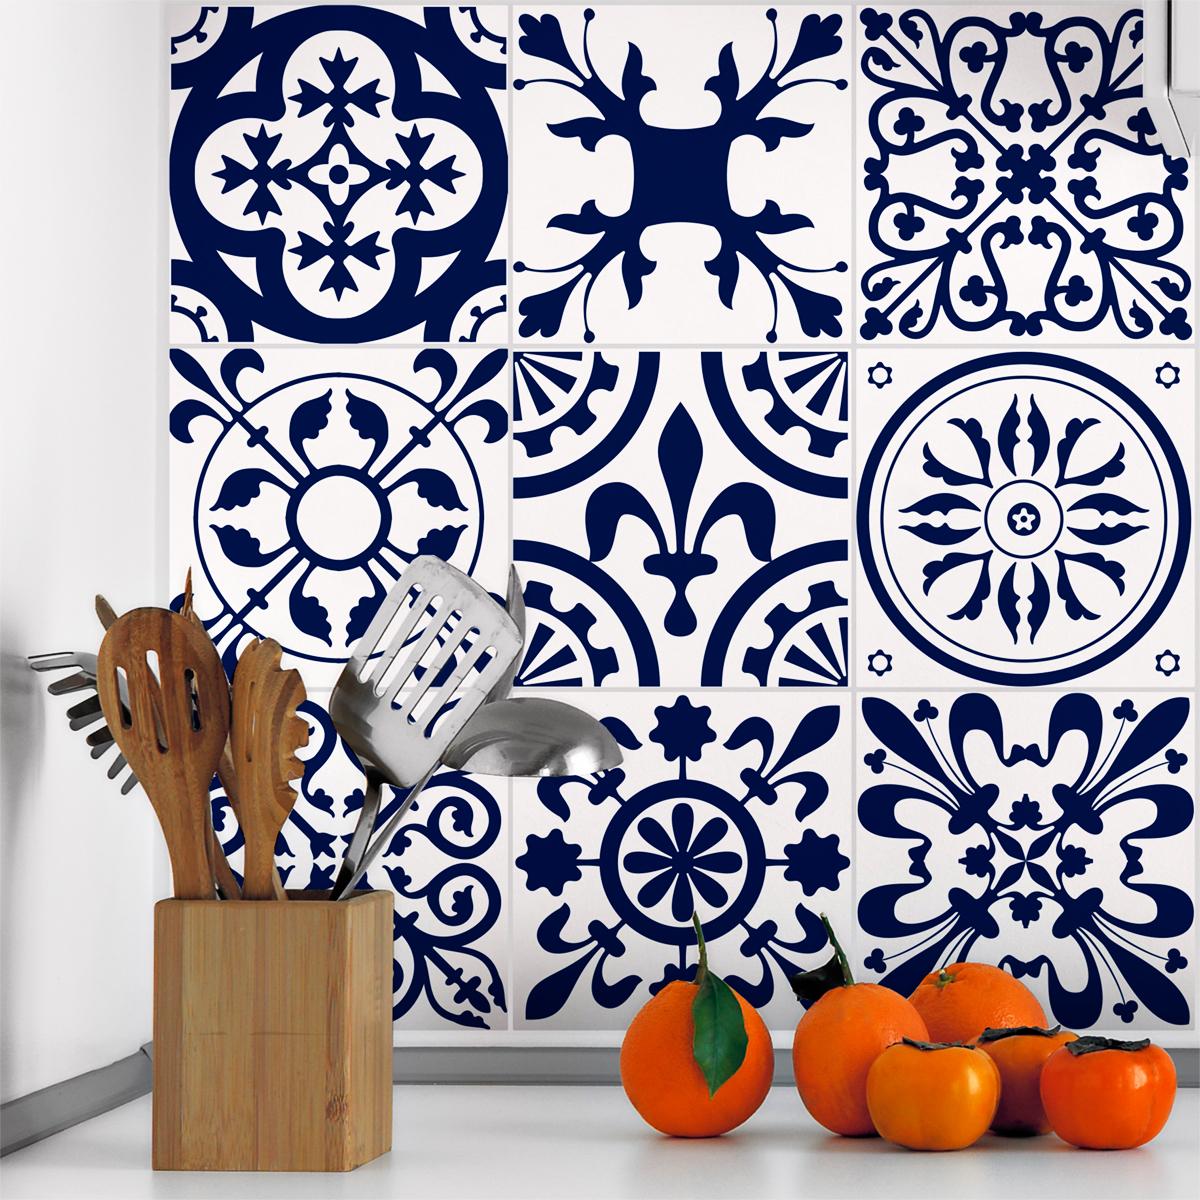 9 stickers carrelages azulejos ornements antiques vintage. Black Bedroom Furniture Sets. Home Design Ideas